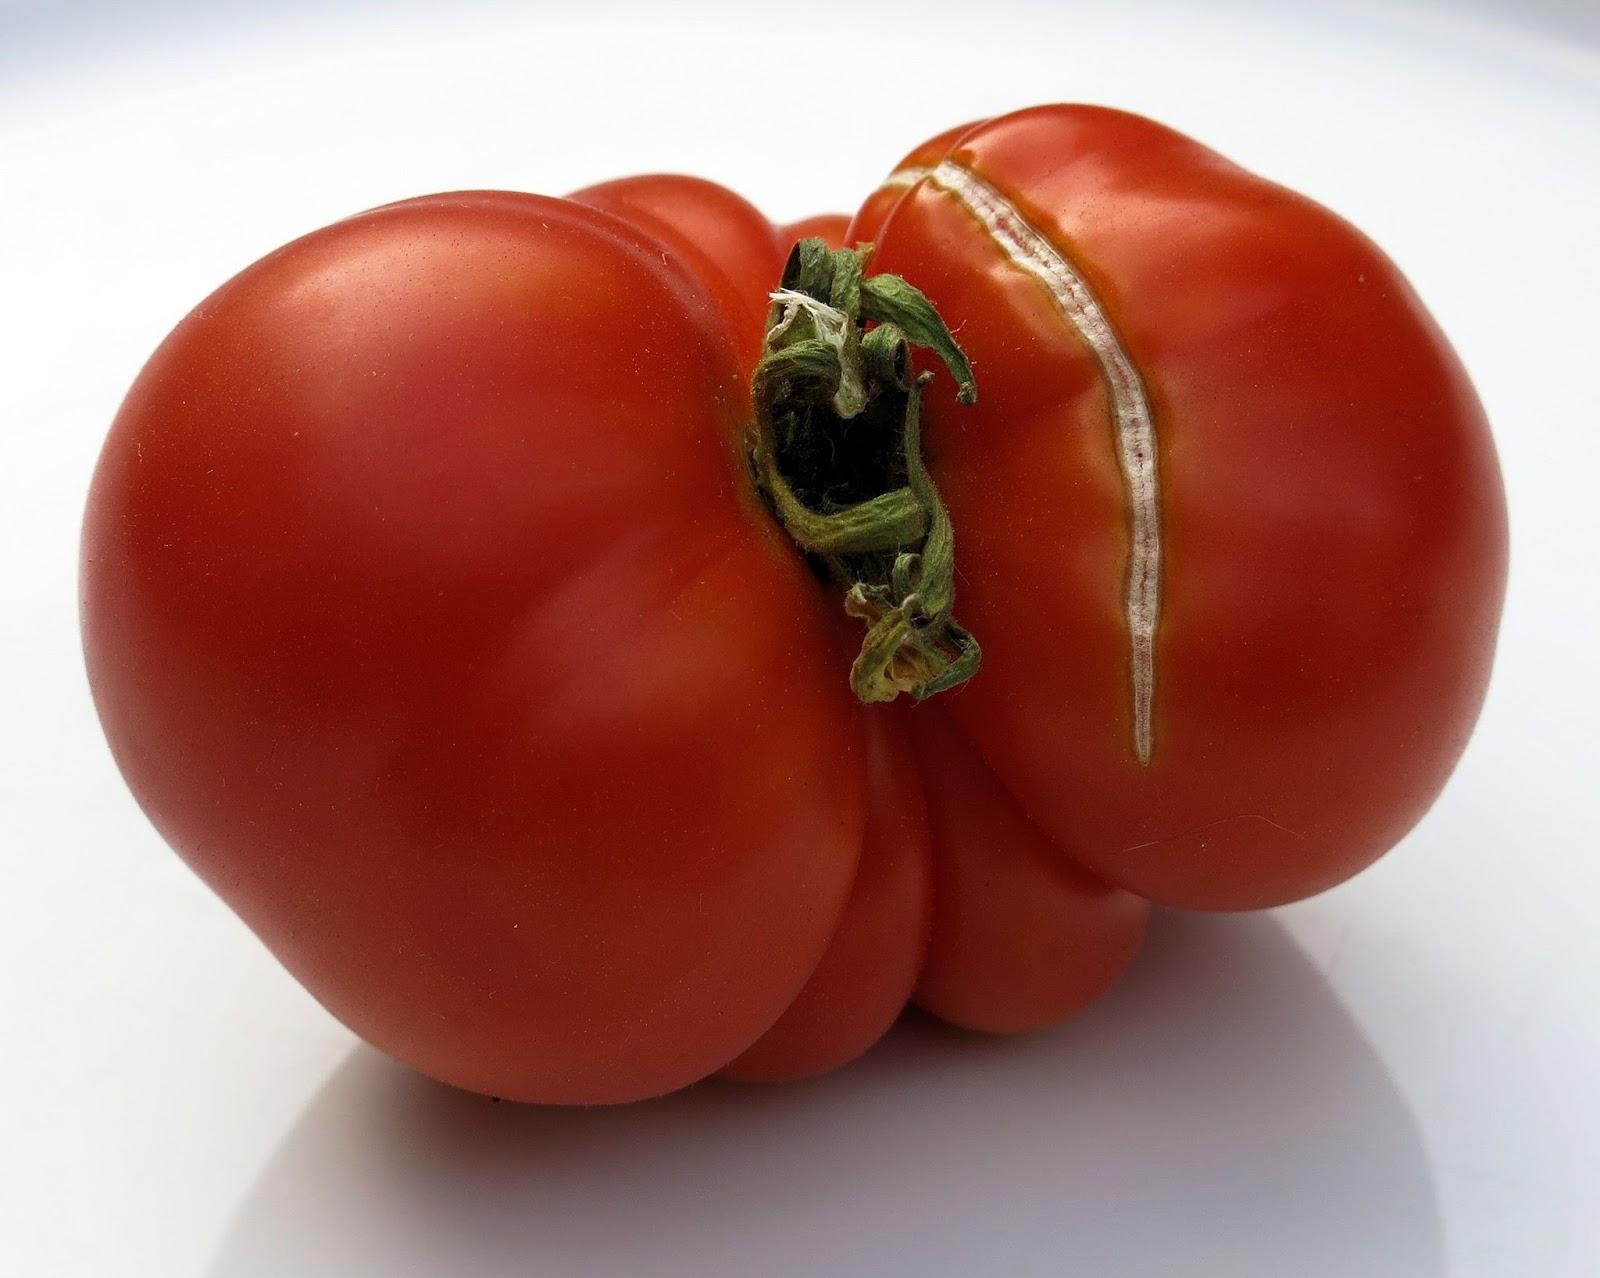 Tomato marmande agm seeds d t brown vegetable seeds - Tomato Marmande Agm Seeds D T Brown Vegetable Seeds Marmande Type Multi Locular Cordon Supplier Franchi